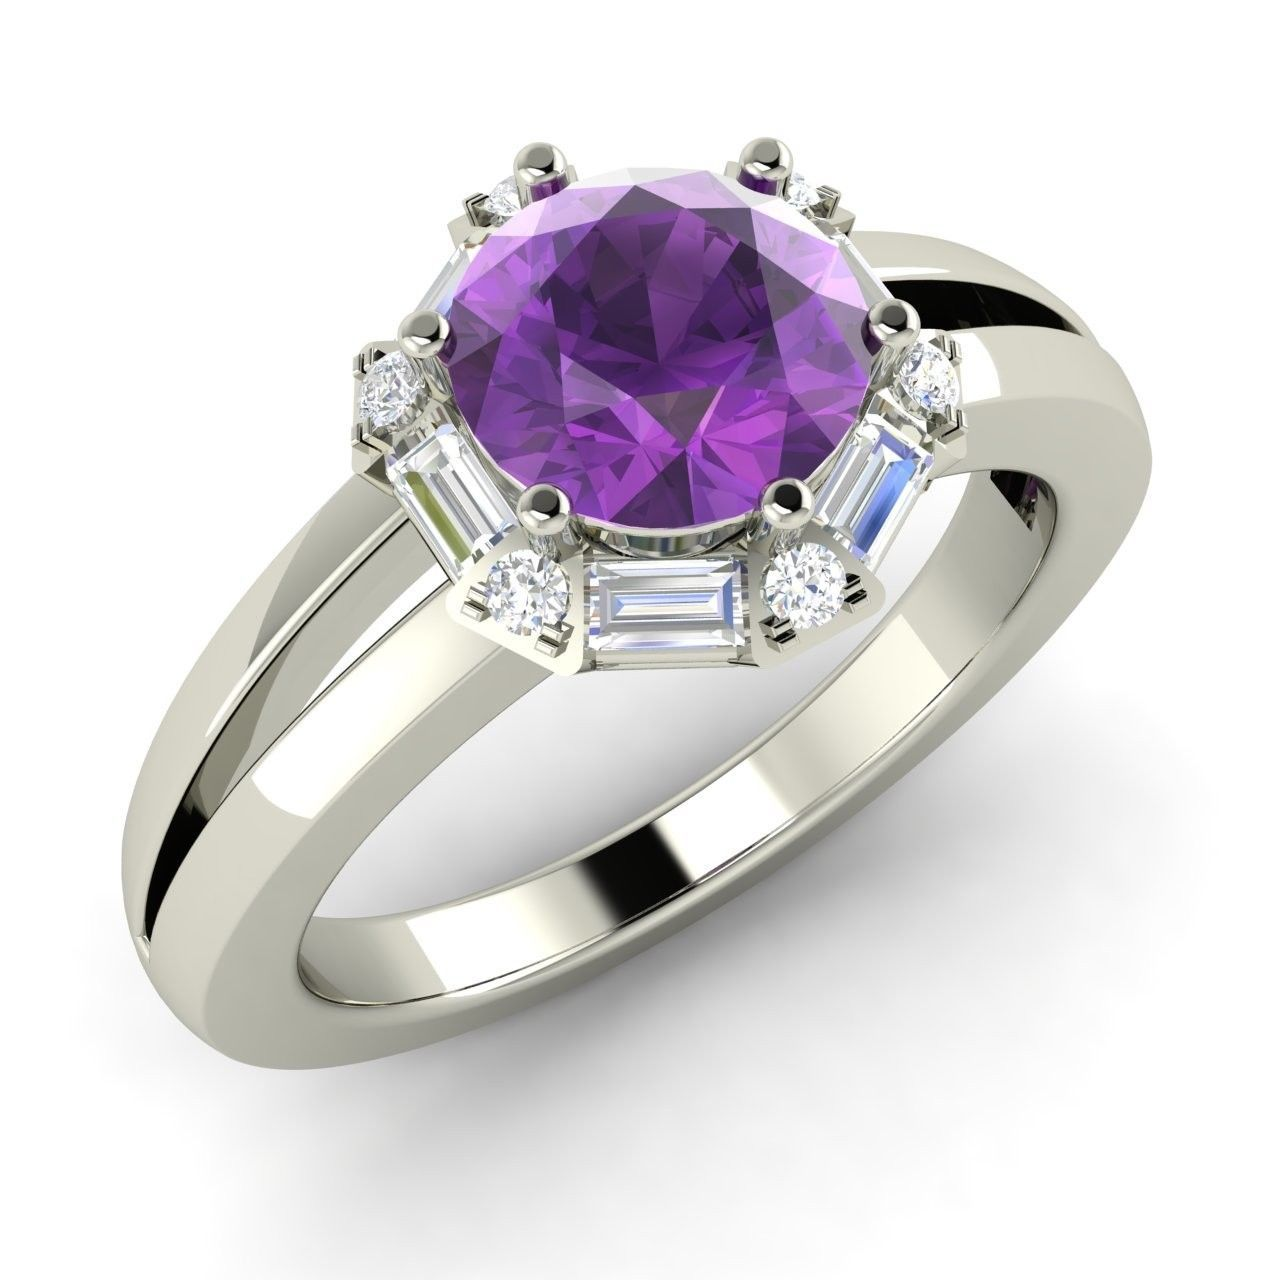 Engagement Rings Vs Wedding Bands: 1.27 Carat Purple Amethyst Engagement Ring In 14k White